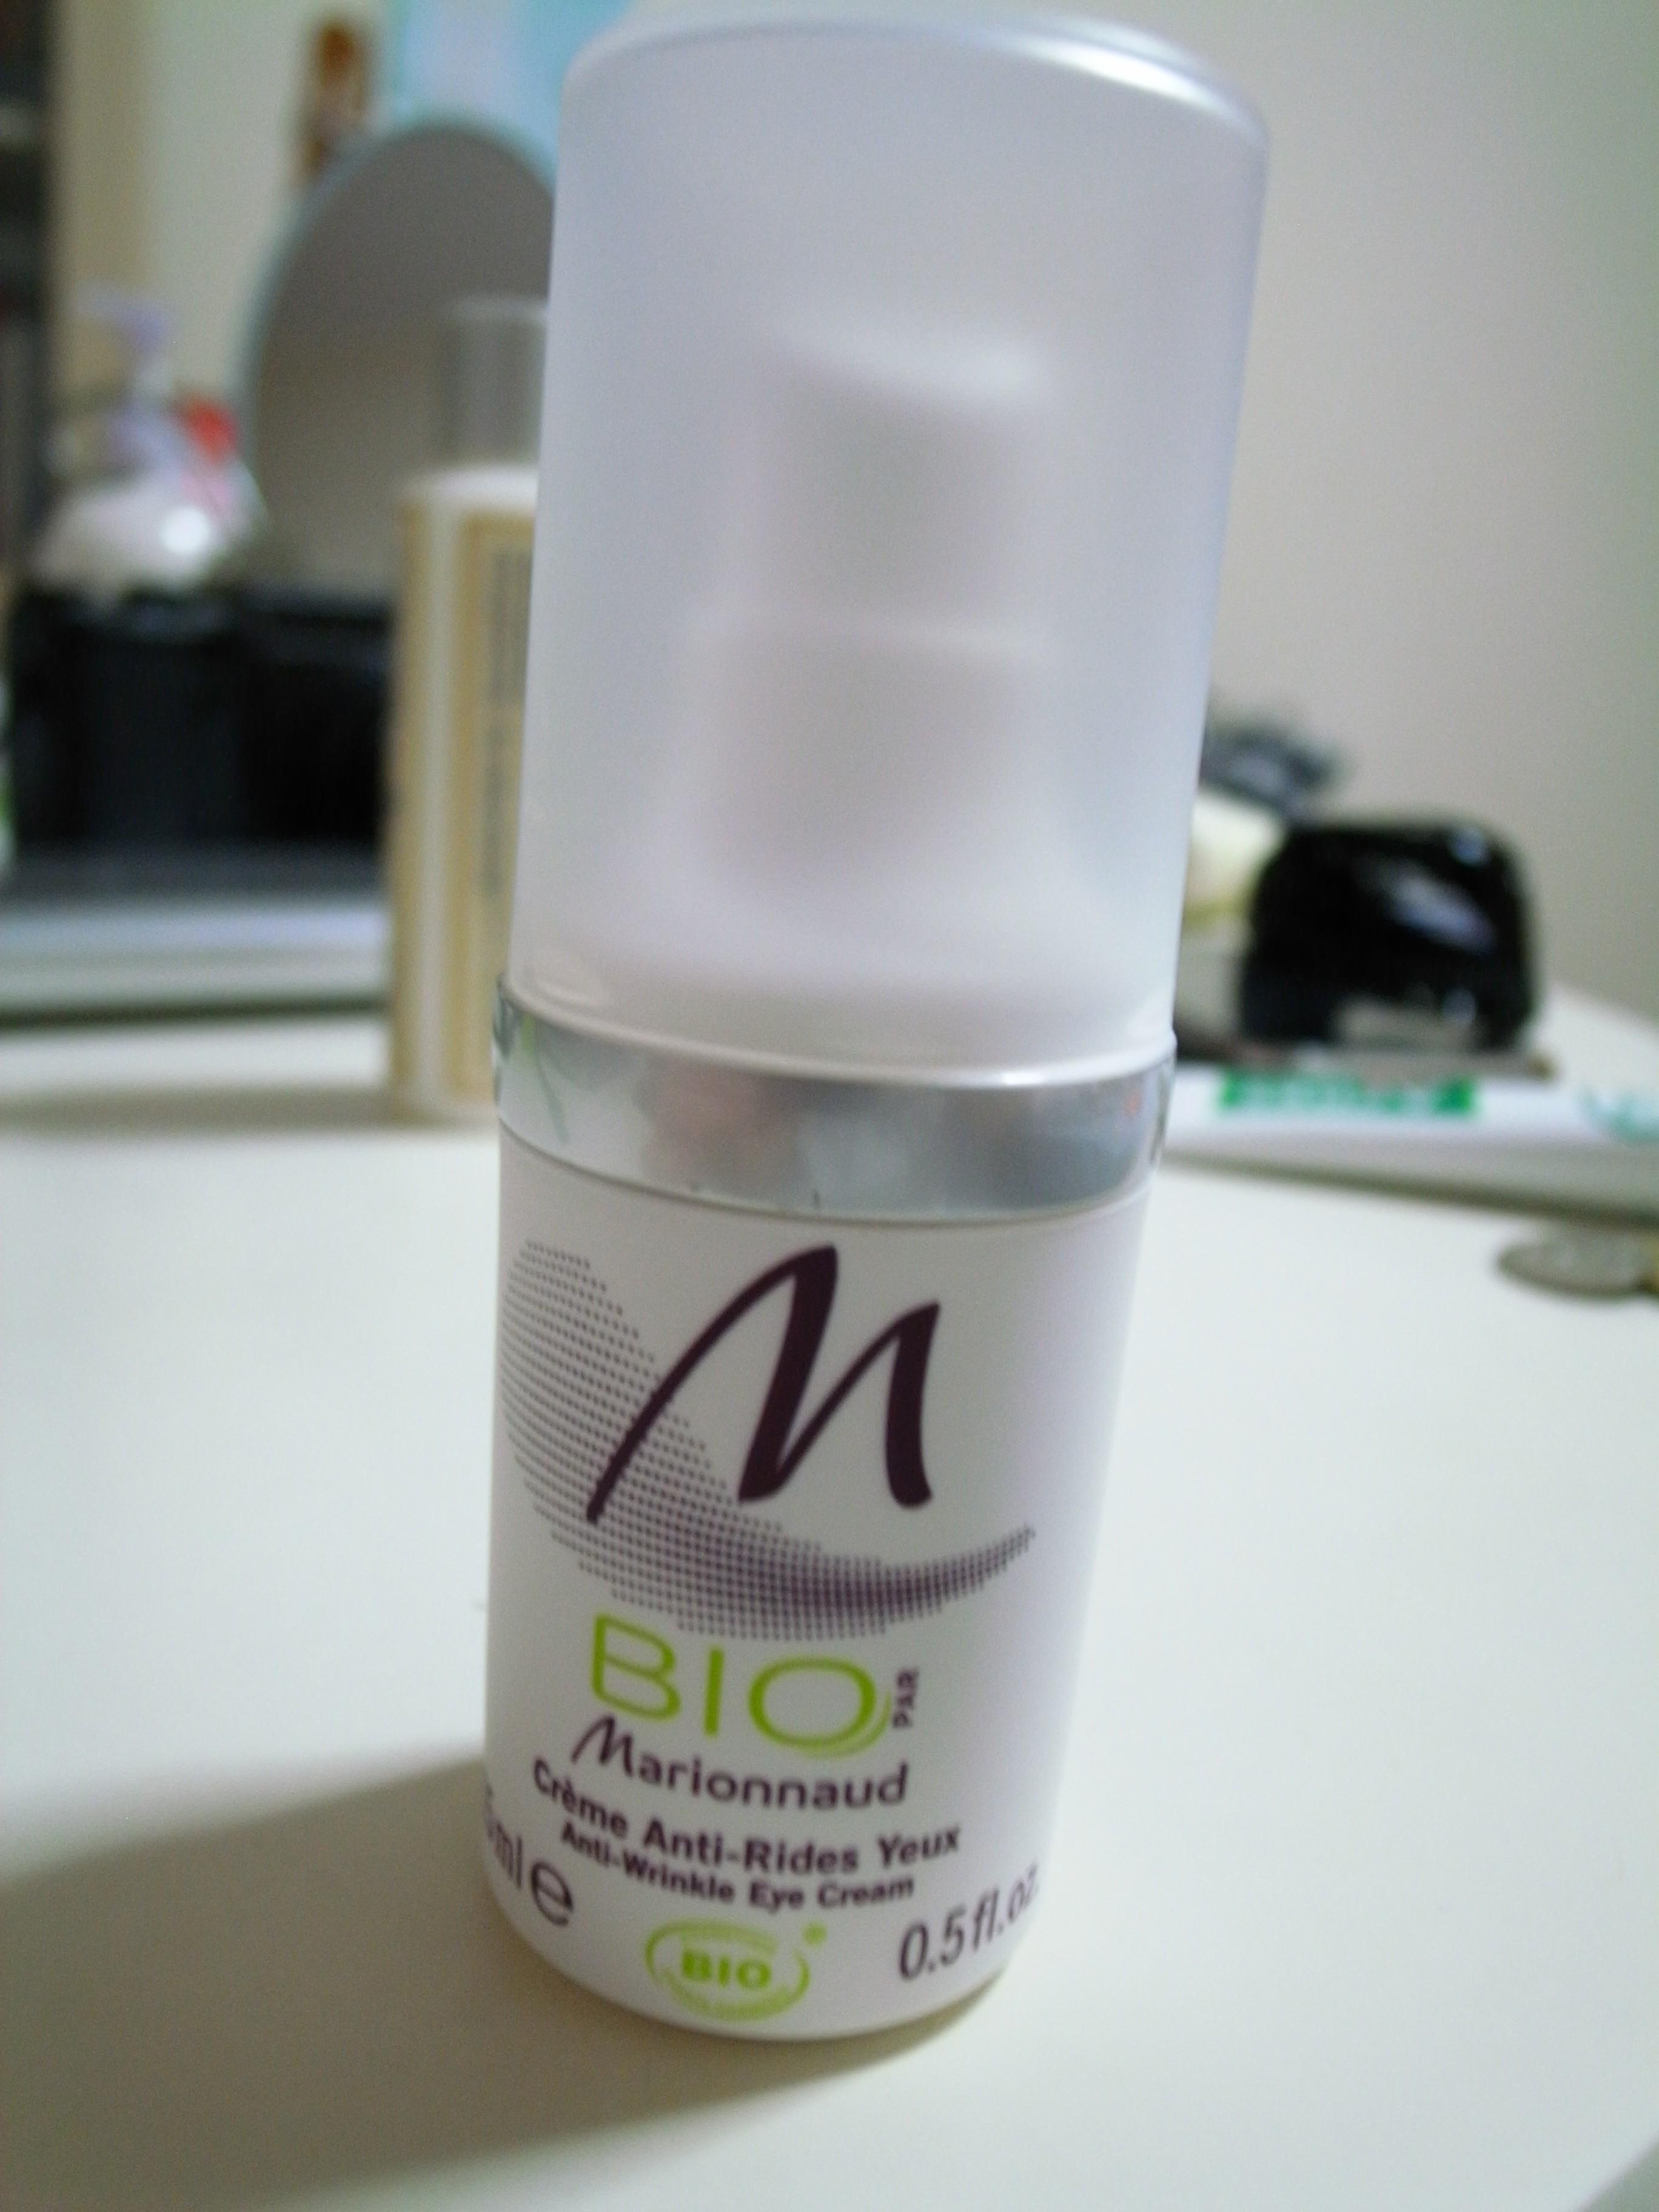 Bio Marionnaud 的 天然潤膚有機抗皺眼霜 (Anti-Wrinkle Eye Cream) | 朵兒Koffee